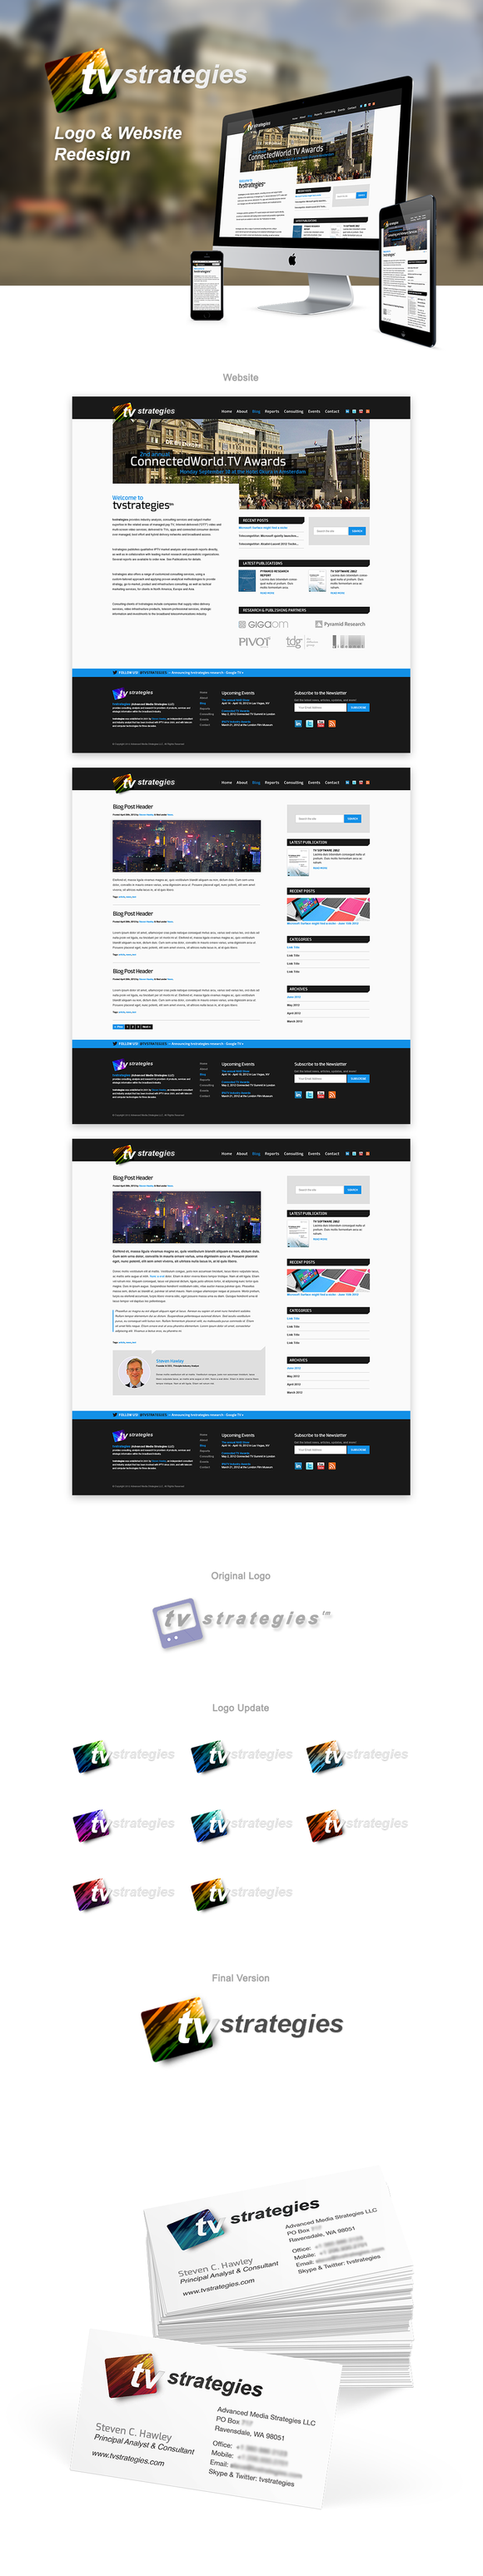 TVStrategies Website and Identity Update